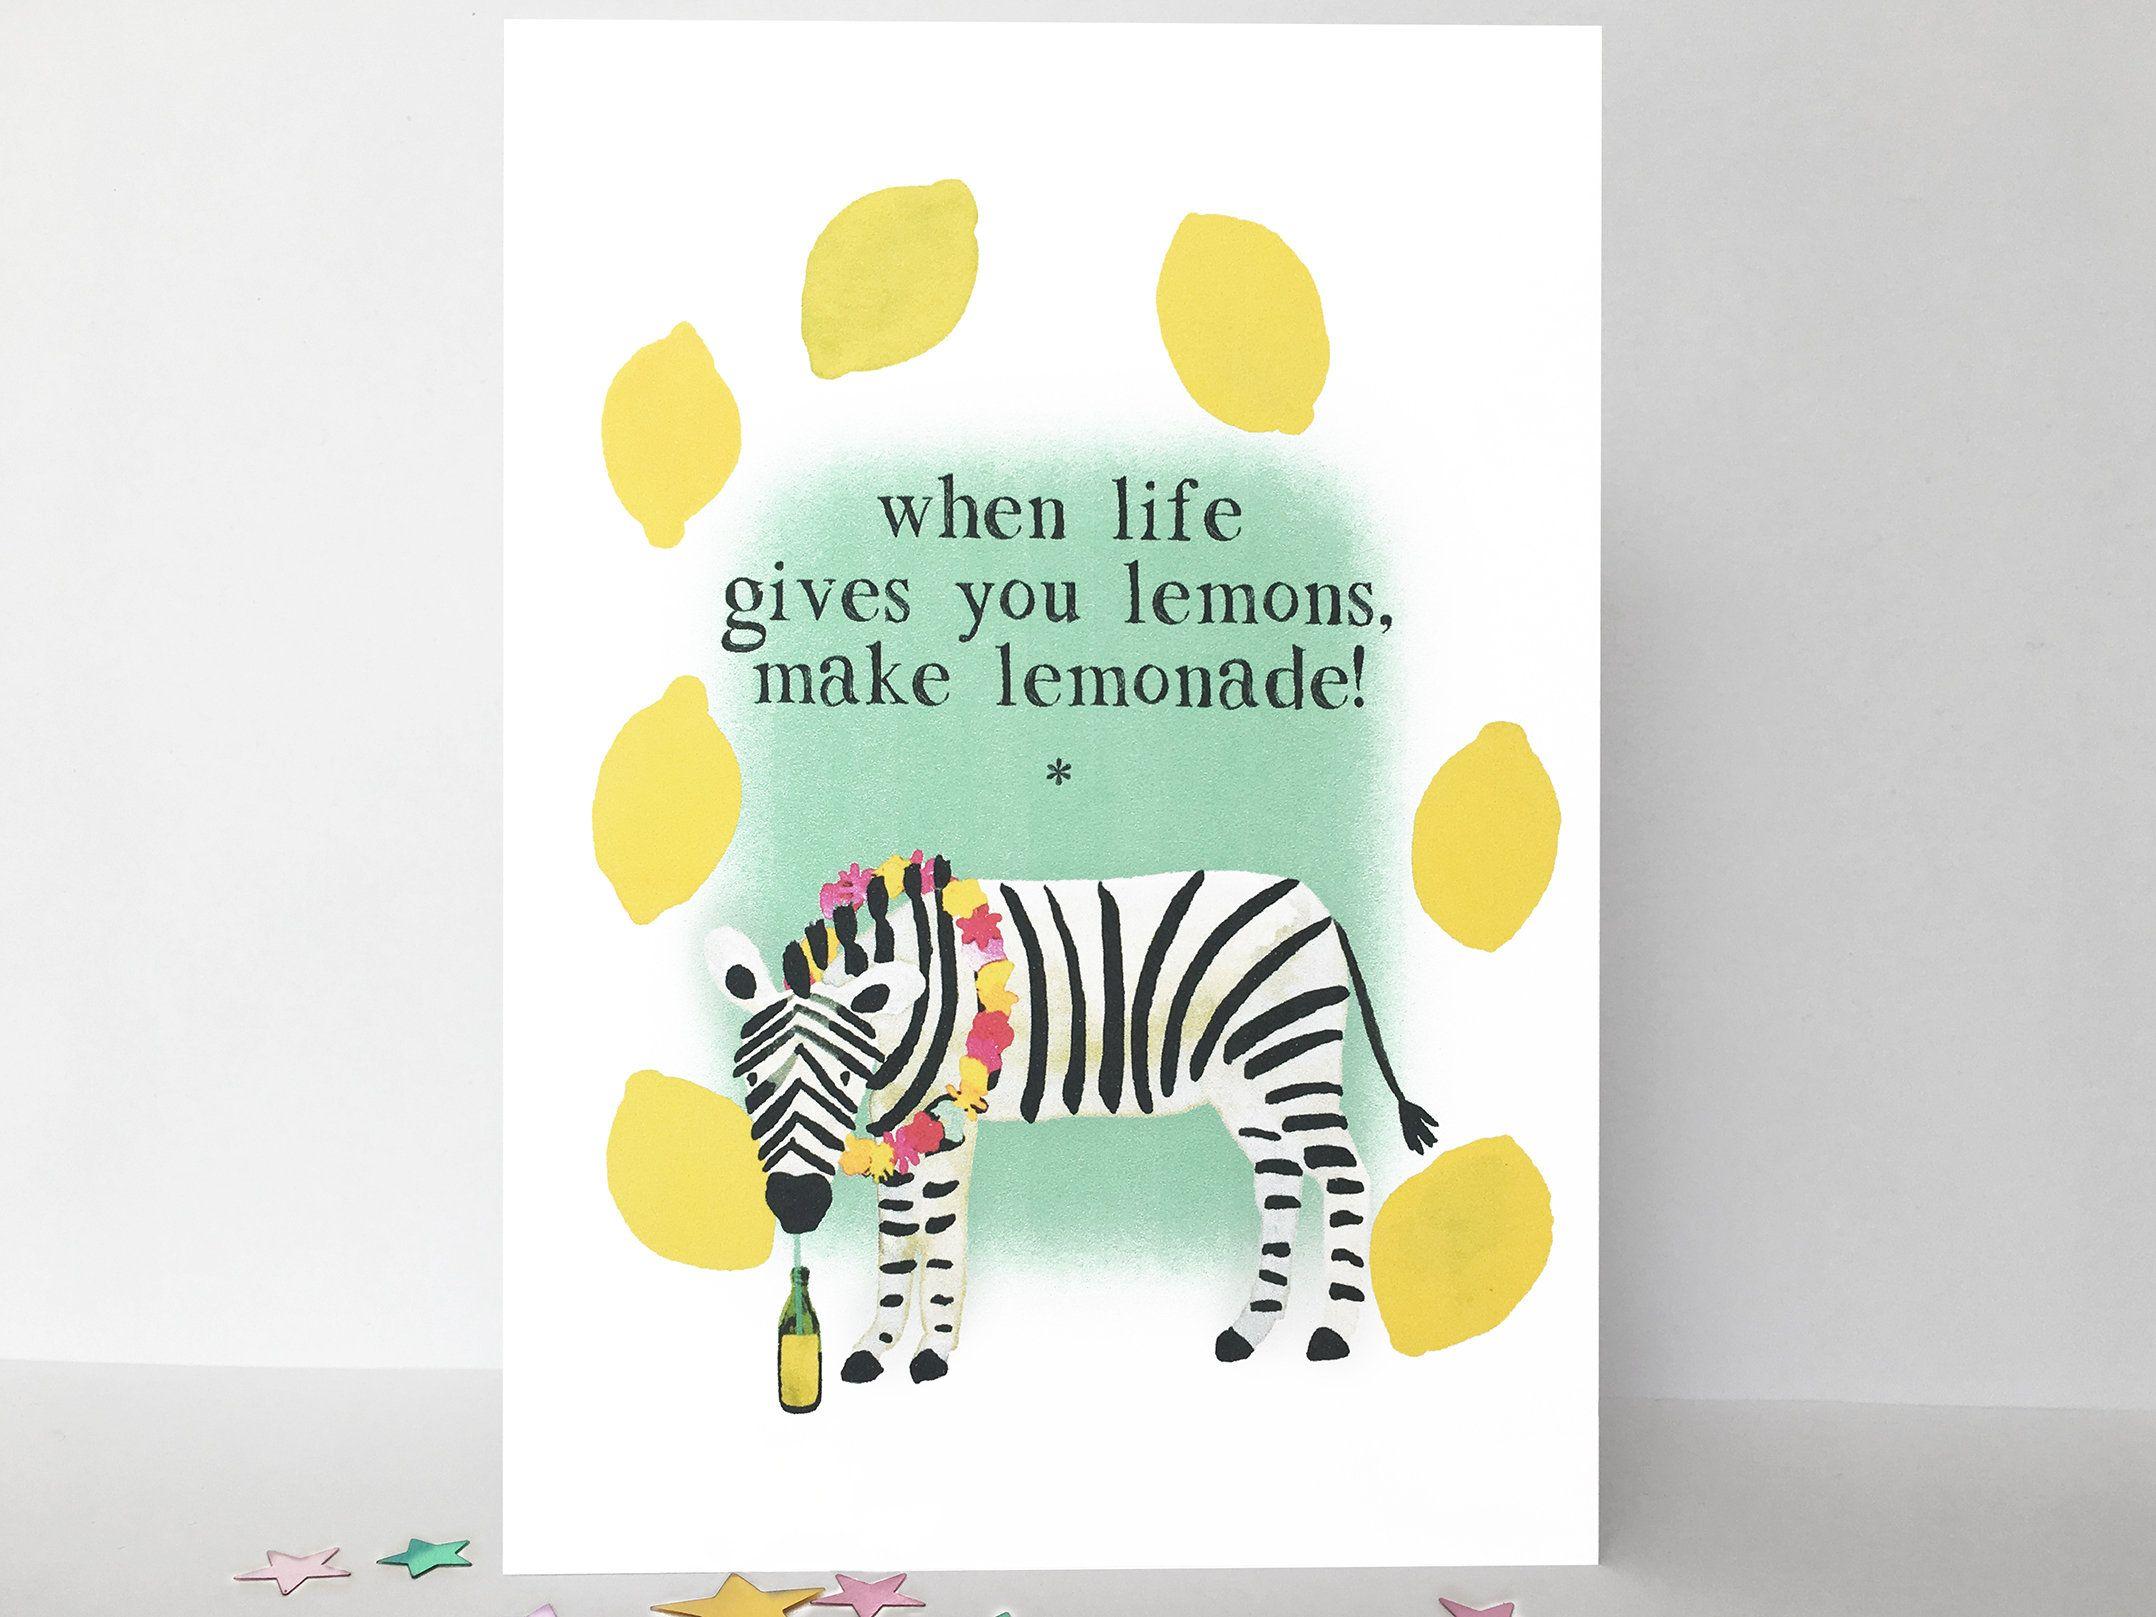 Zebra And Lemons Greetings Card When Life Gives You Lemons